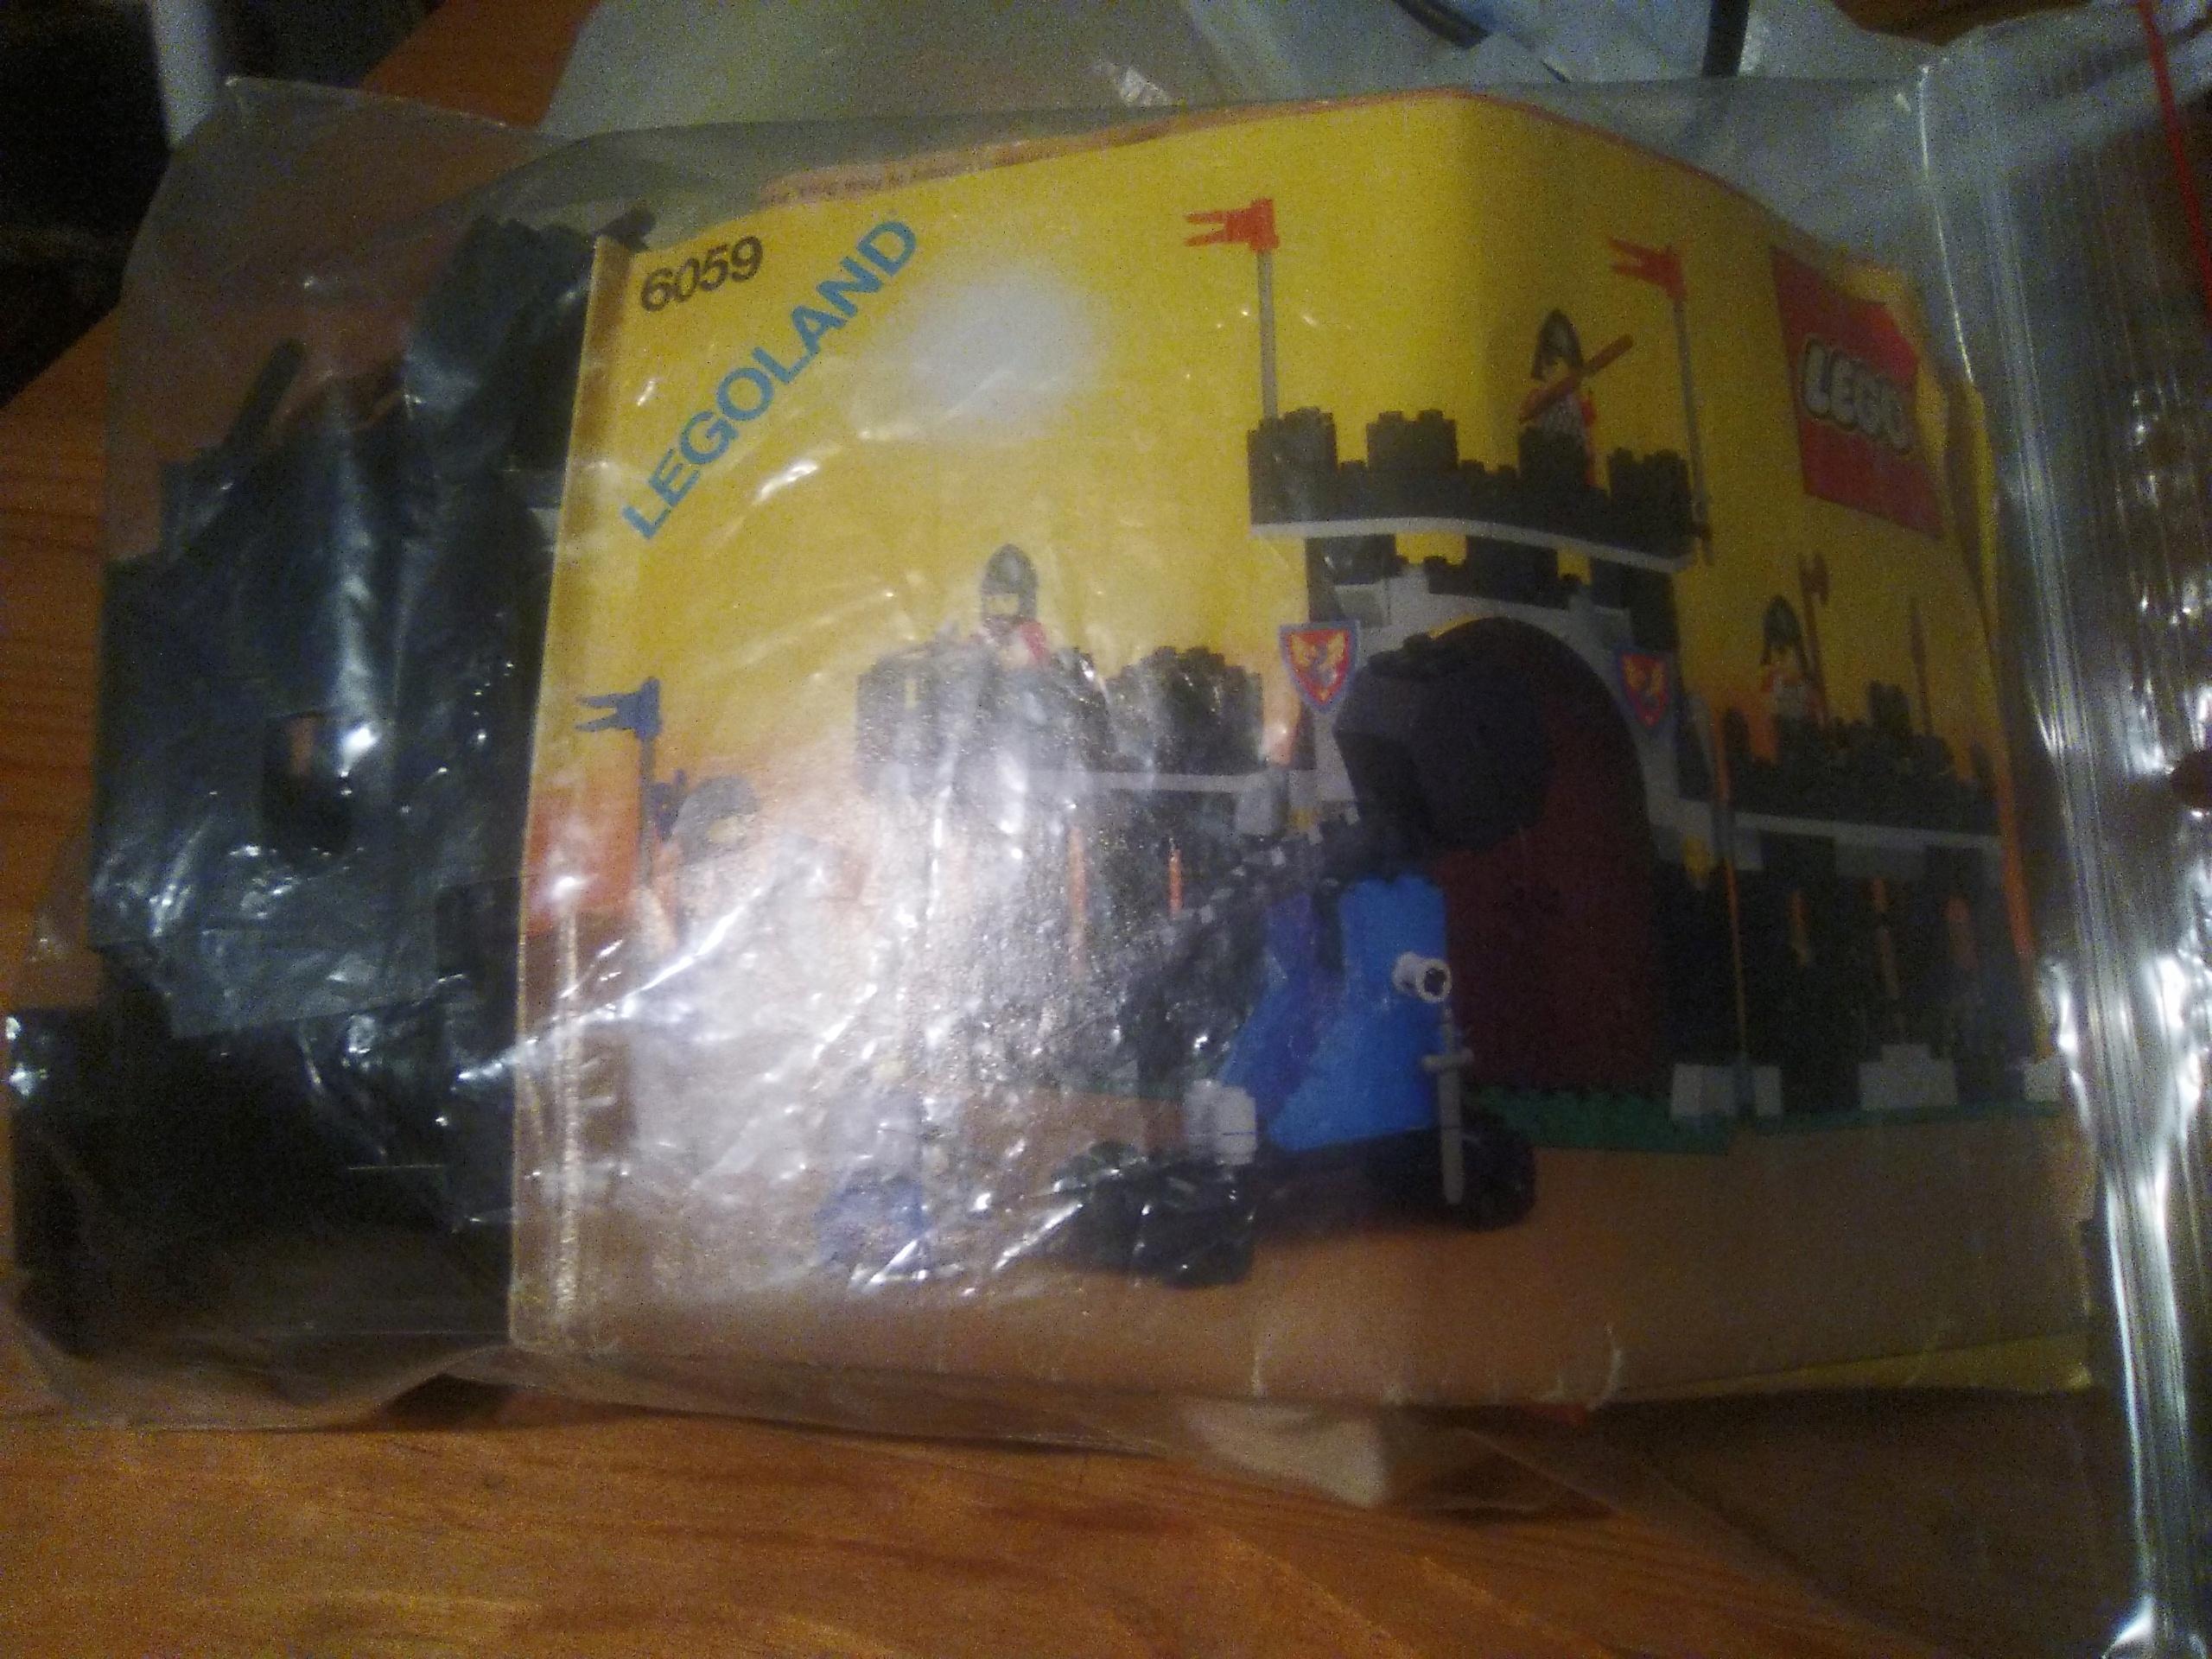 6059 zestaw lego kompletny bez pudełka